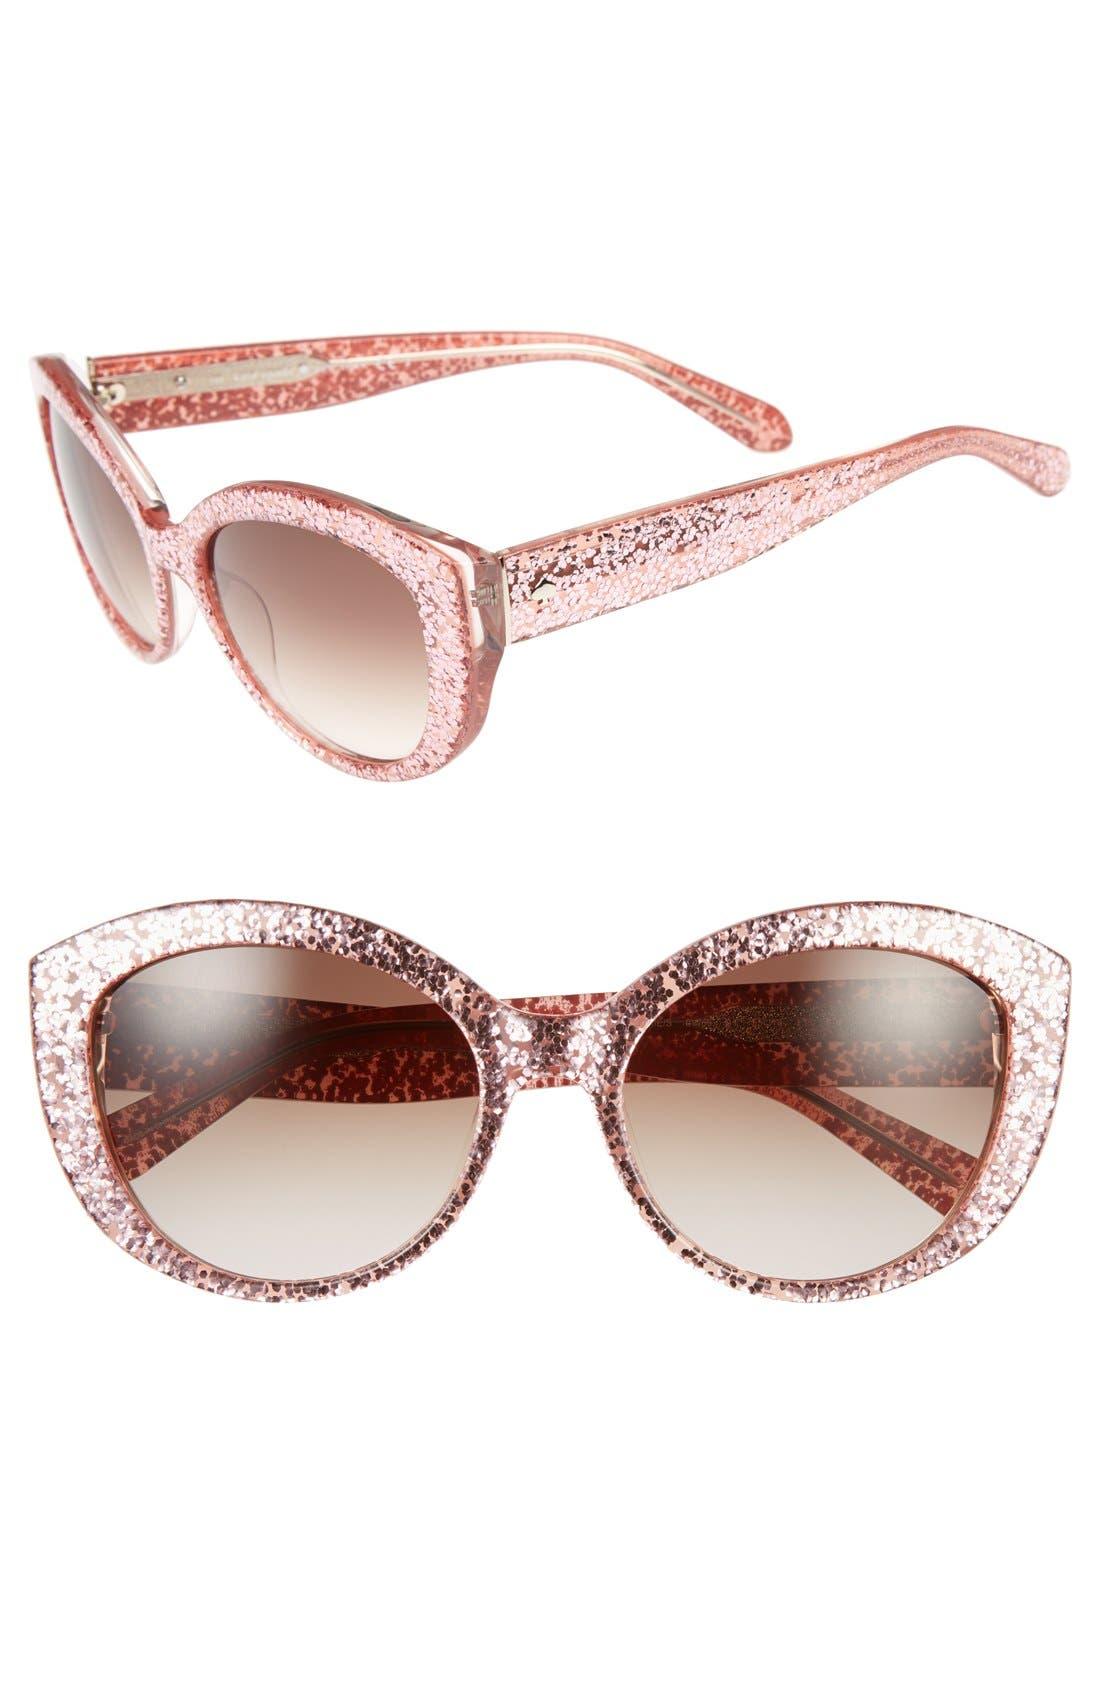 Main Image - kate spade new york 'sherrie' 55mm cat eye sunglasses